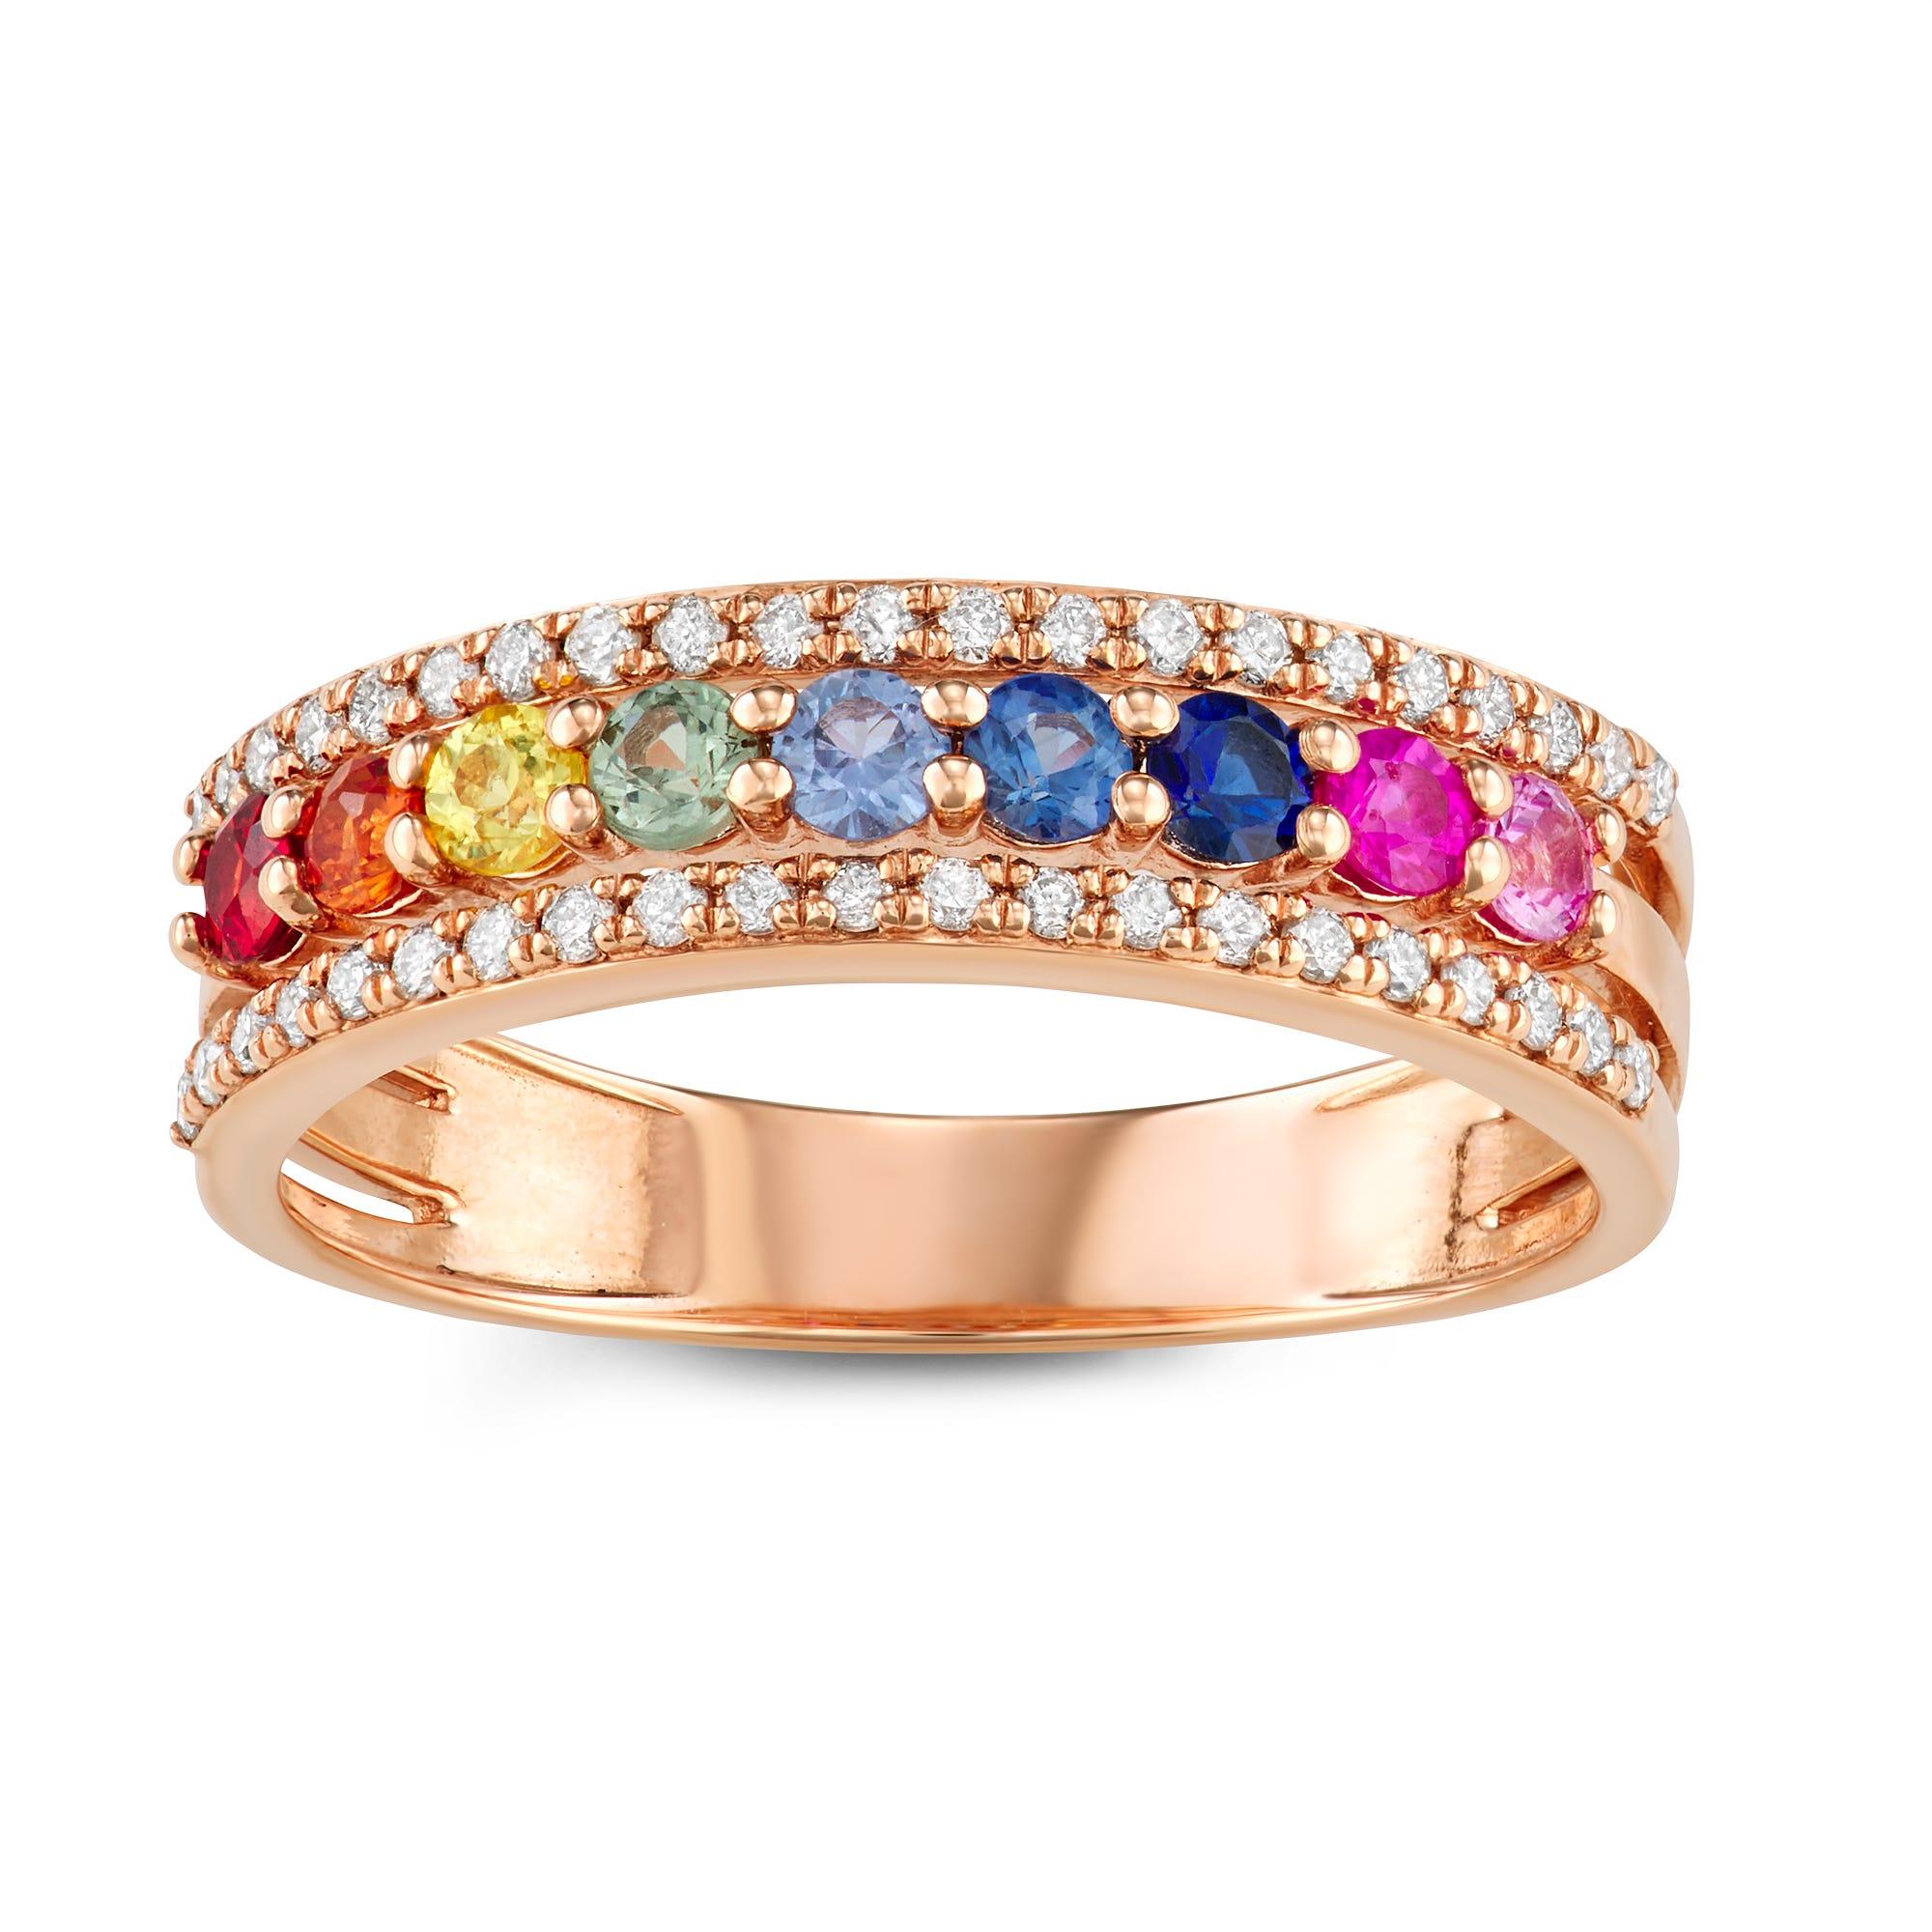 Multi-Color Sapphire & Diamond Ring in 14k Rose Gold